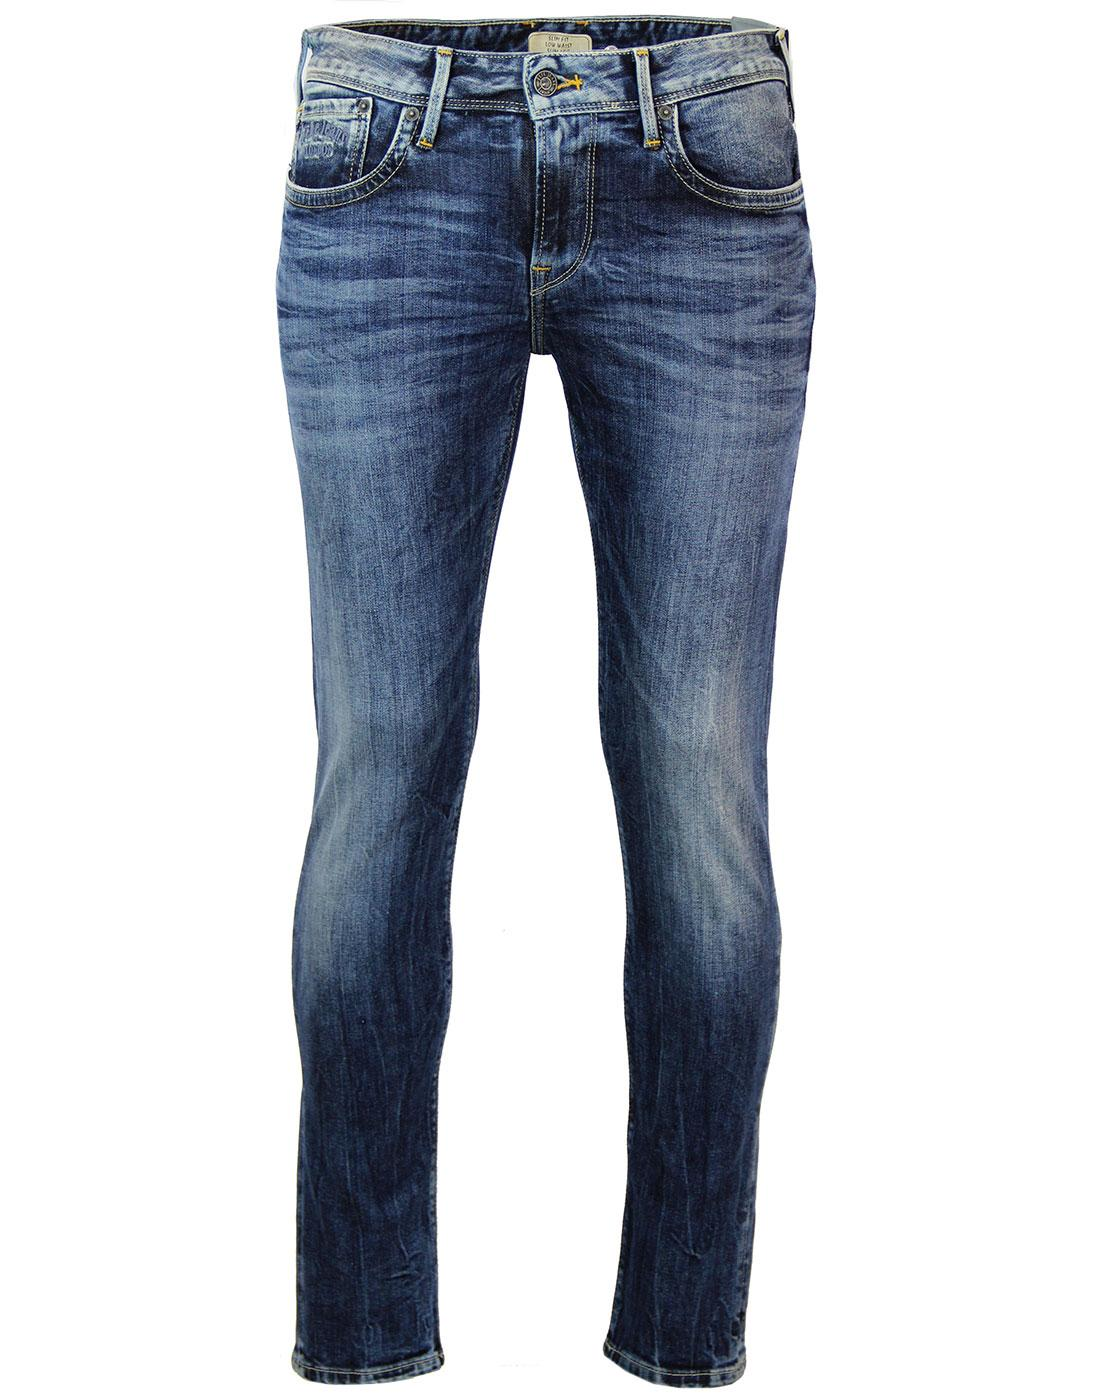 Hatch PEPE JEANS Retro Distressed Slim Jeans Z23